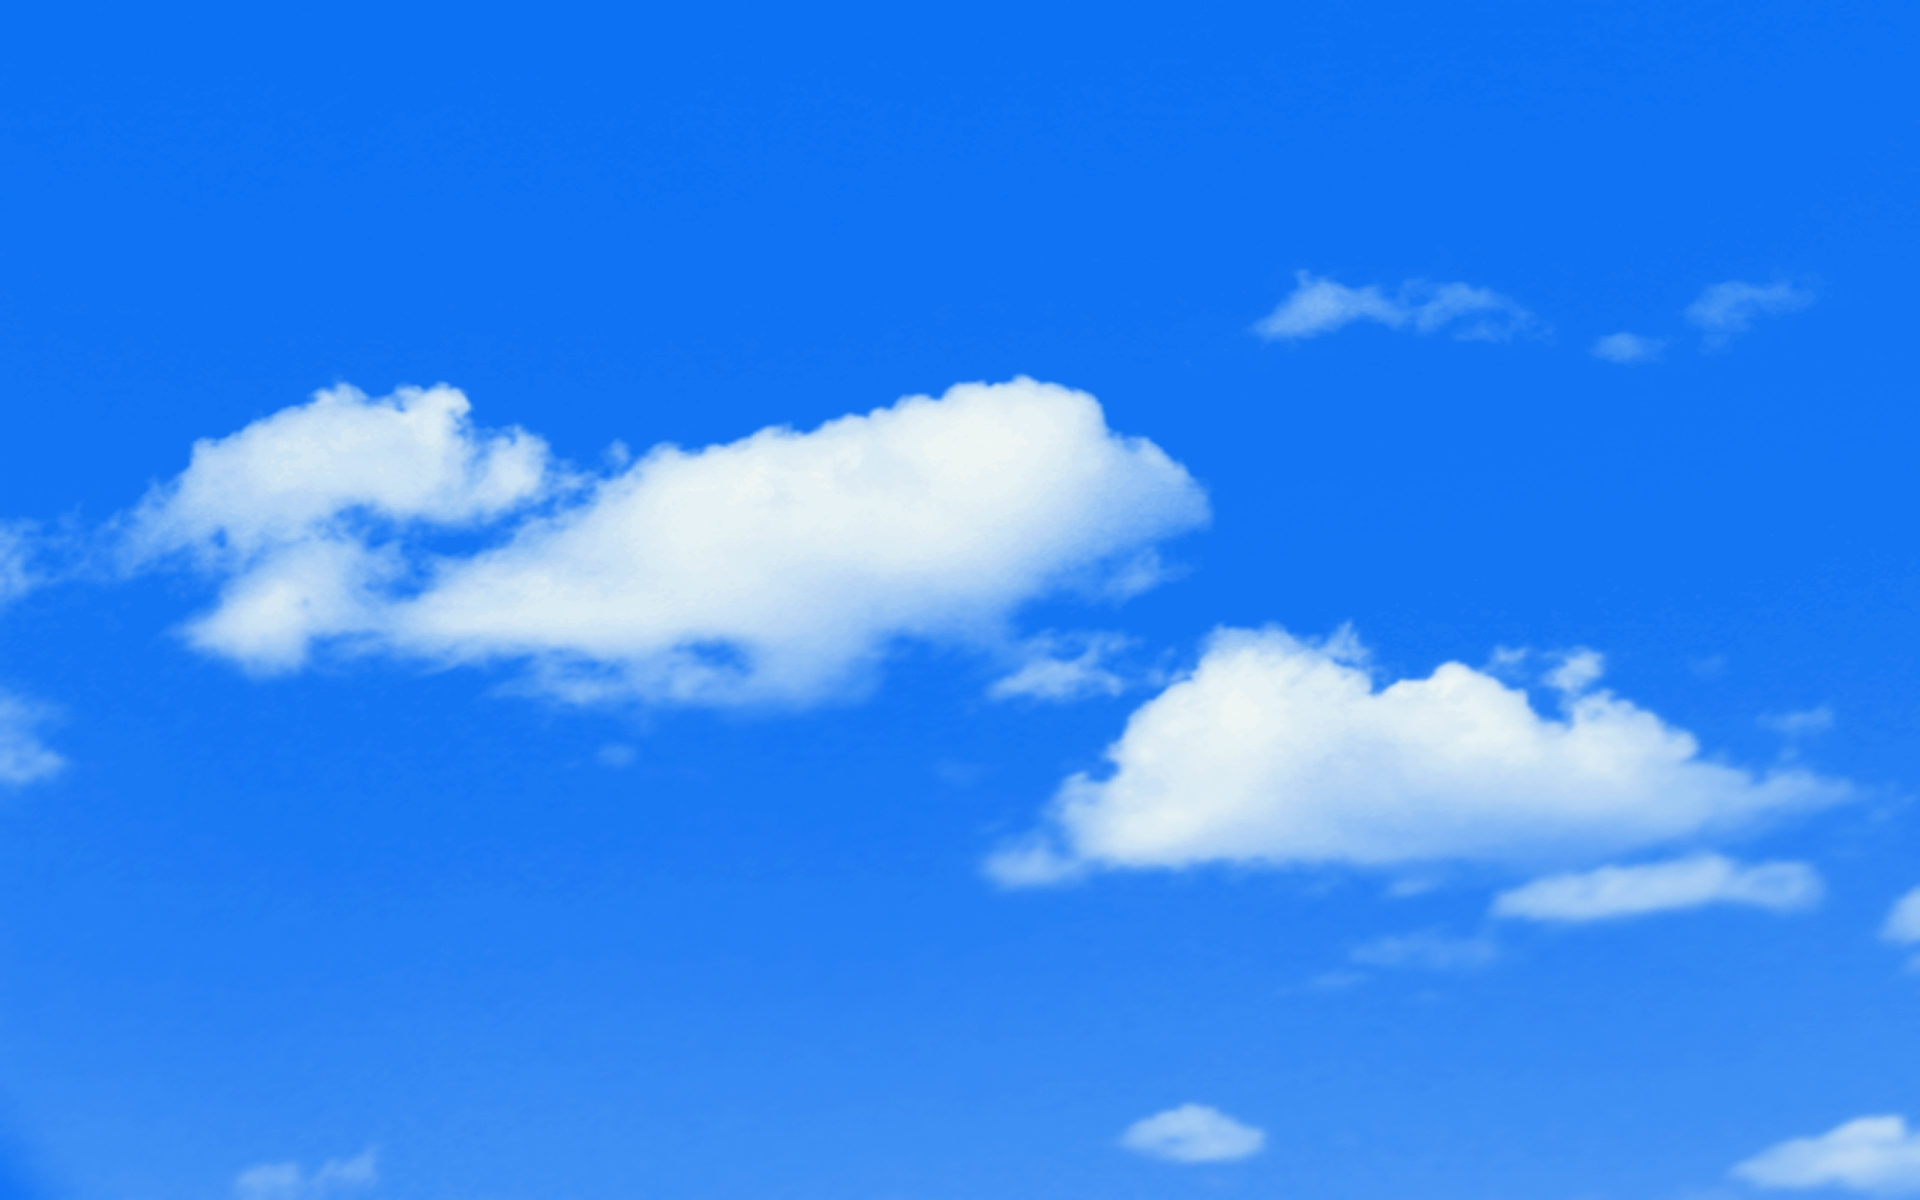 blue sky new desktop wallpaper